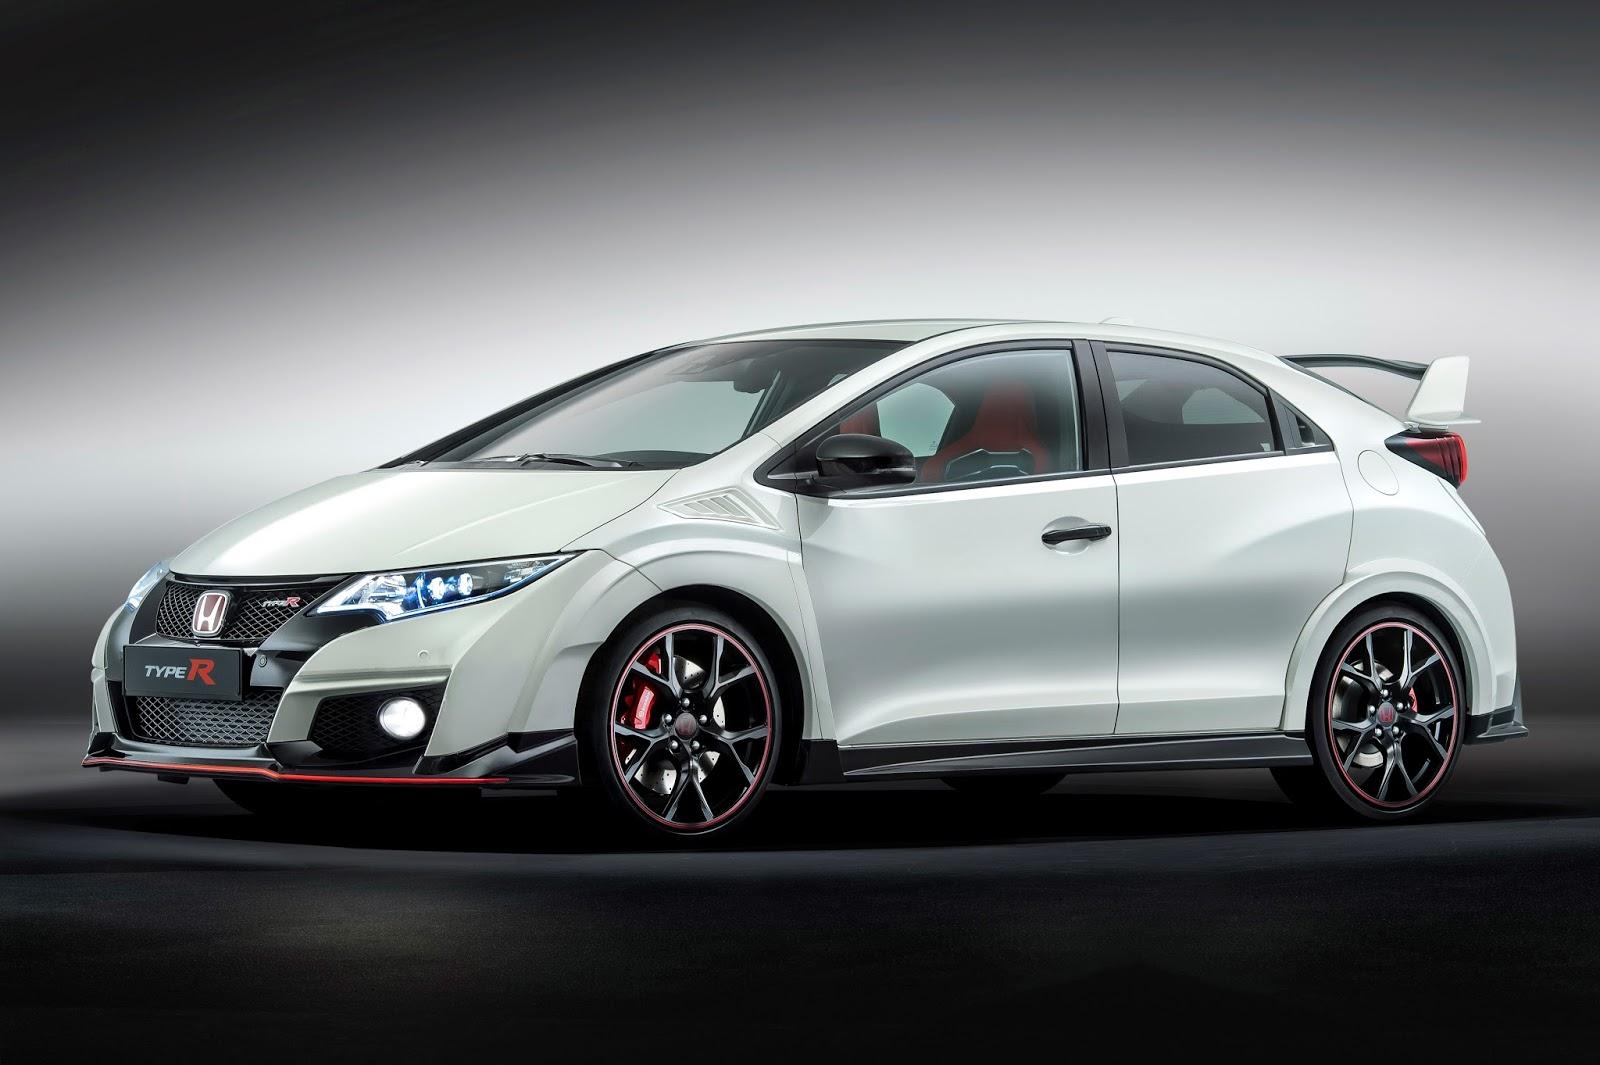 43873 Civic Type R Η Honda θα παρουσιάσει το S660, ενα λιλιπούτειο διθέσιο roadster με 63 άλογα από μολις 658 κ.εκ